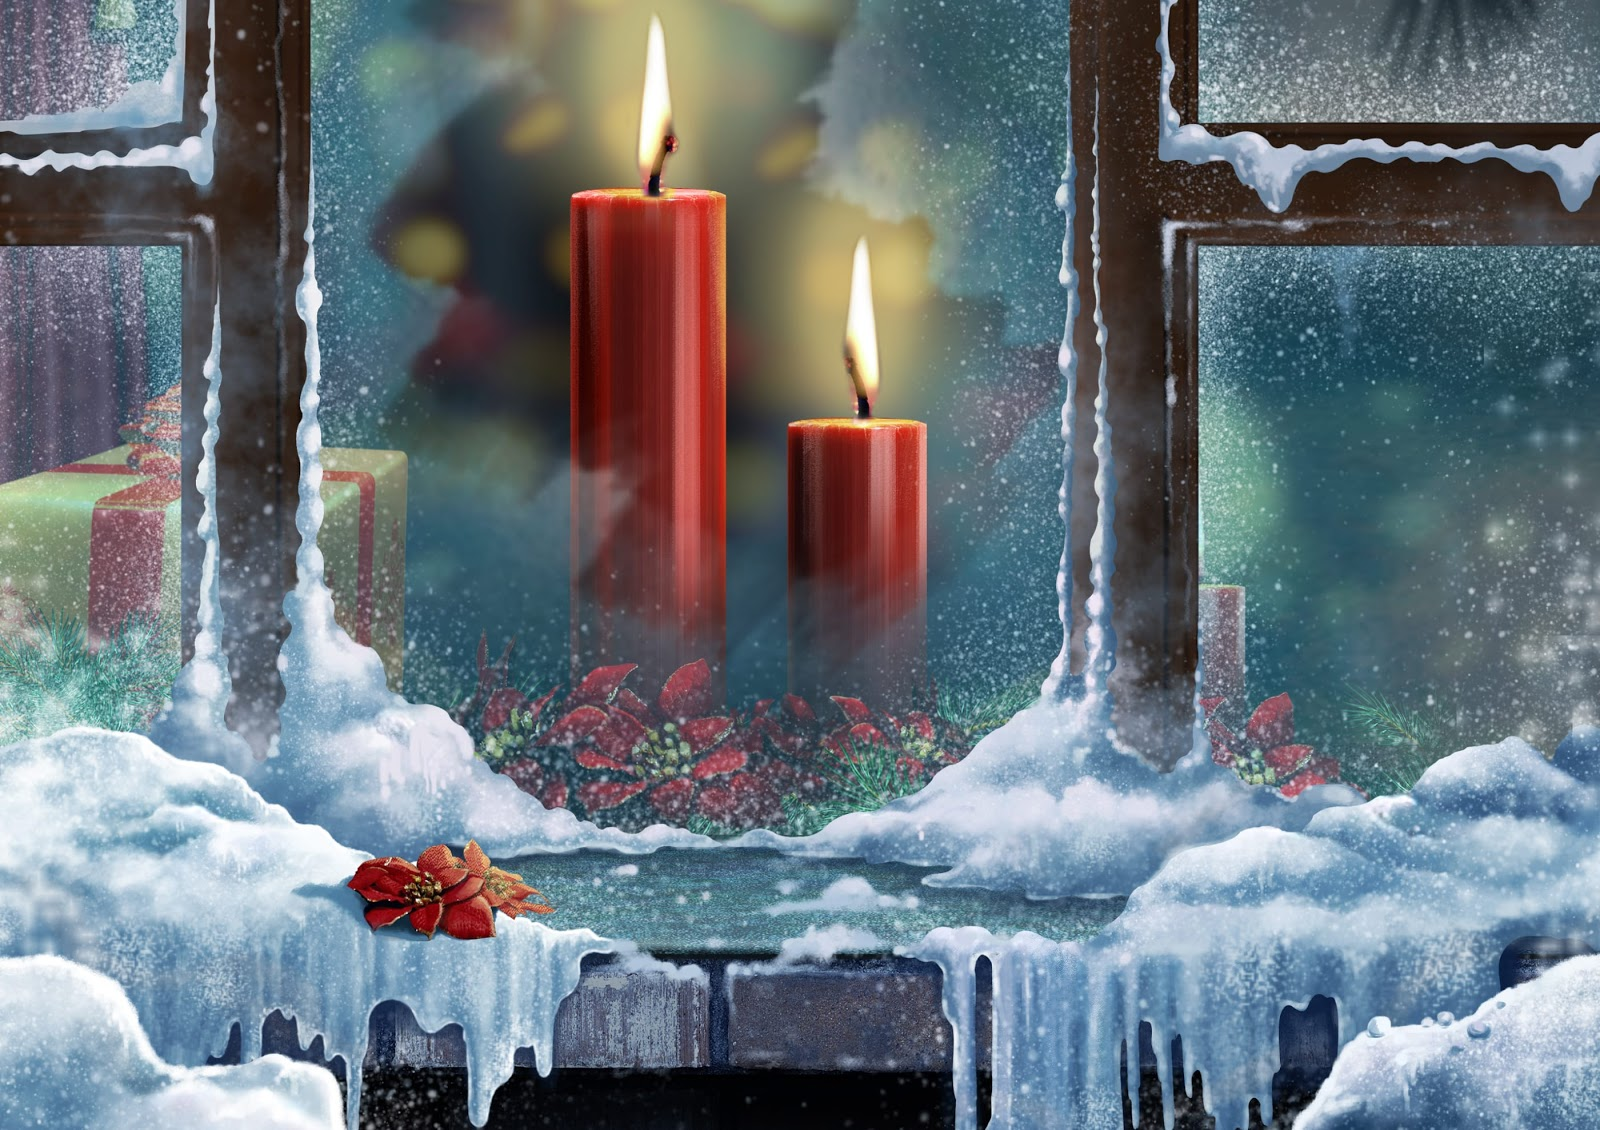 candele rosse, finestra, neve, ghiaccio, vetro